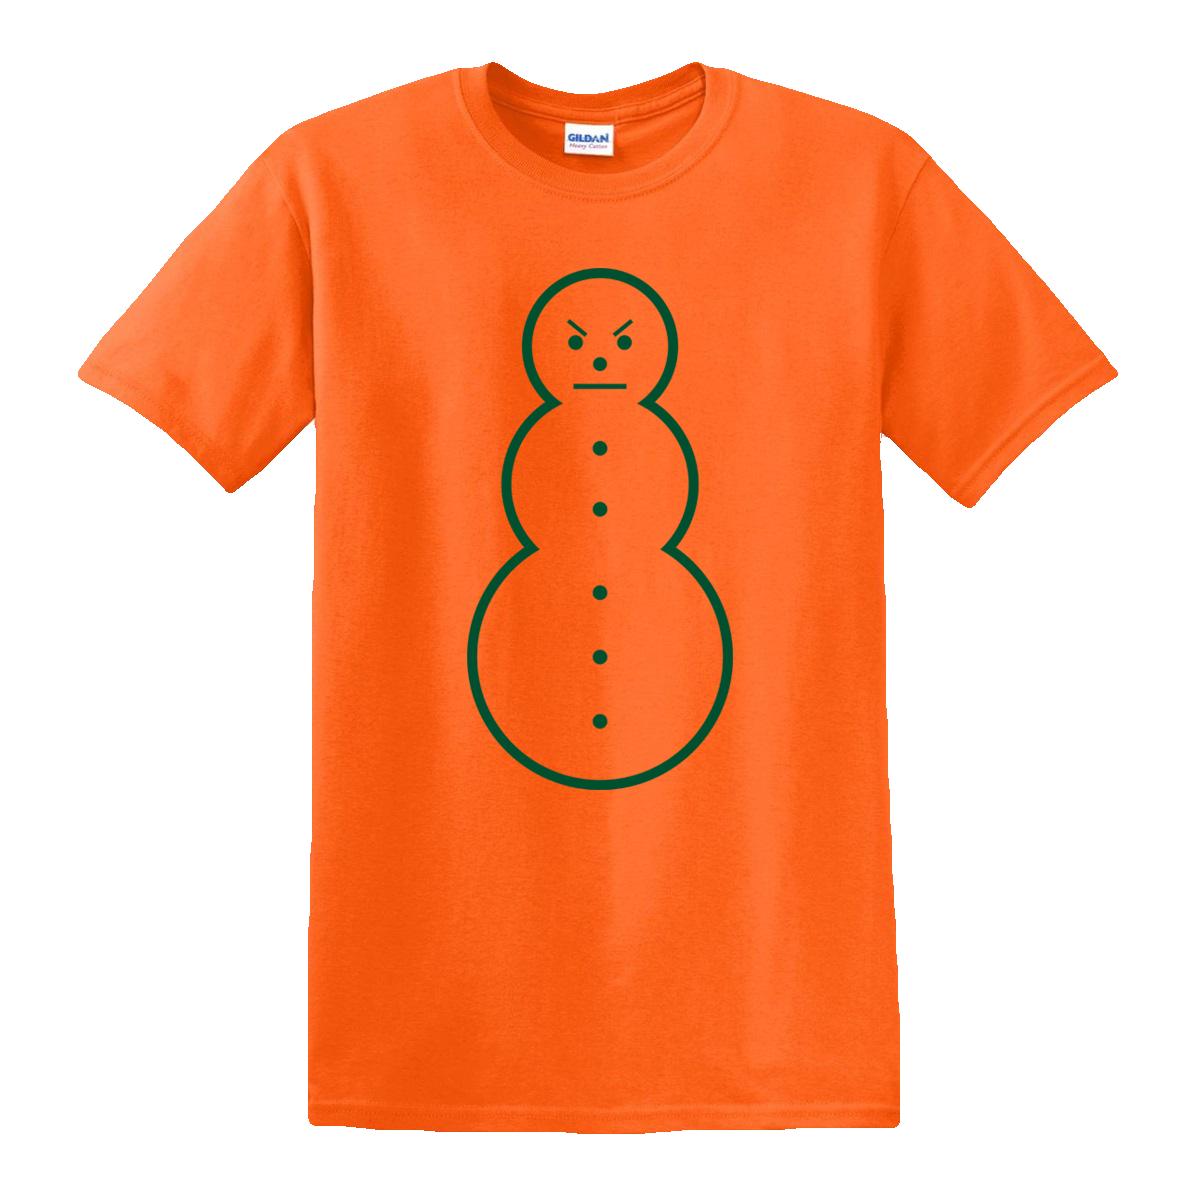 Snowman Tee [Orange/Green] & TM104 Digital Download